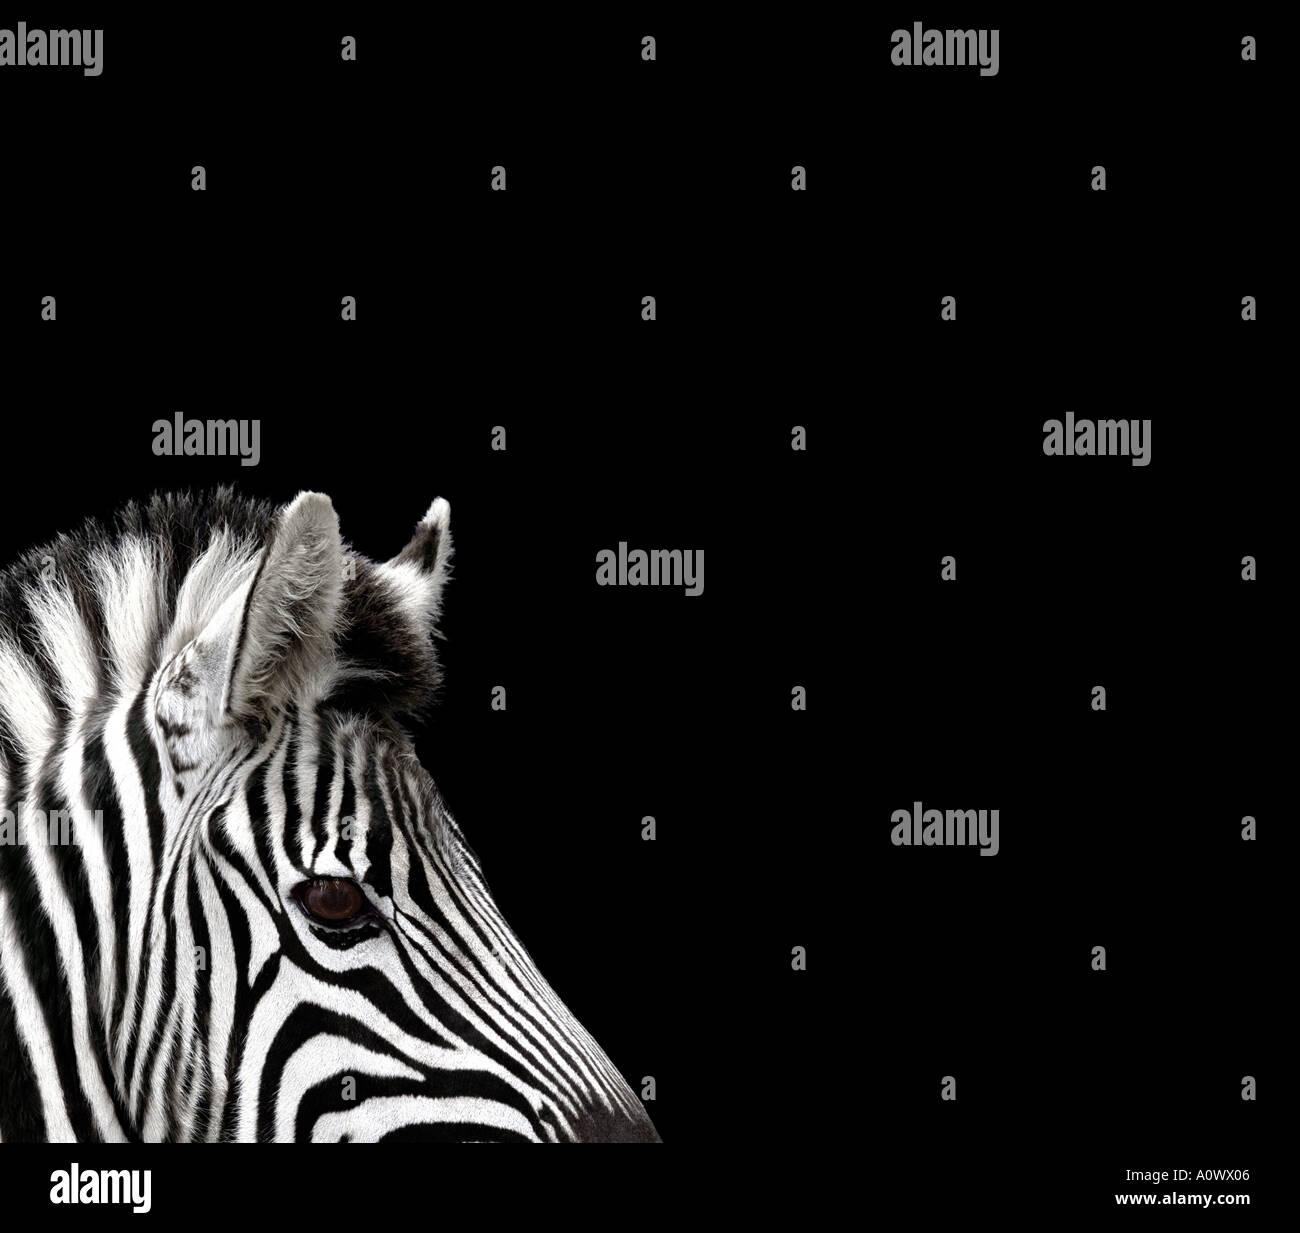 Zebra head on black - Stock Image